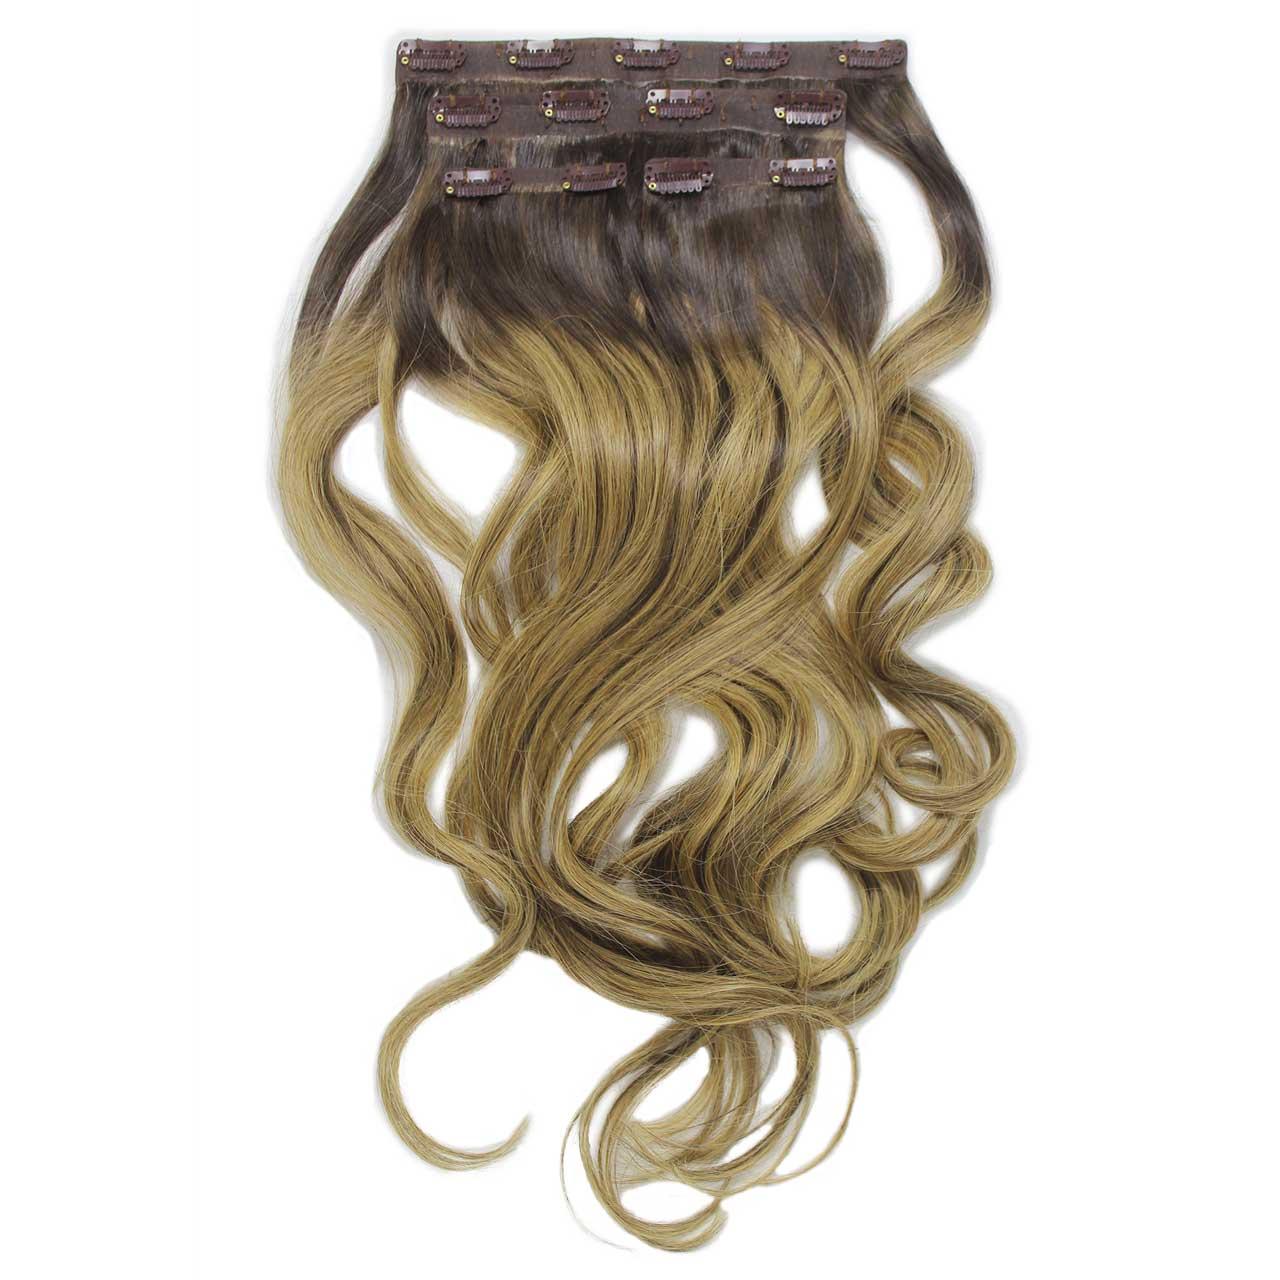 Aplique Tic Tac Ombré Hair 160g Cabelos Humanos Naturais Liso